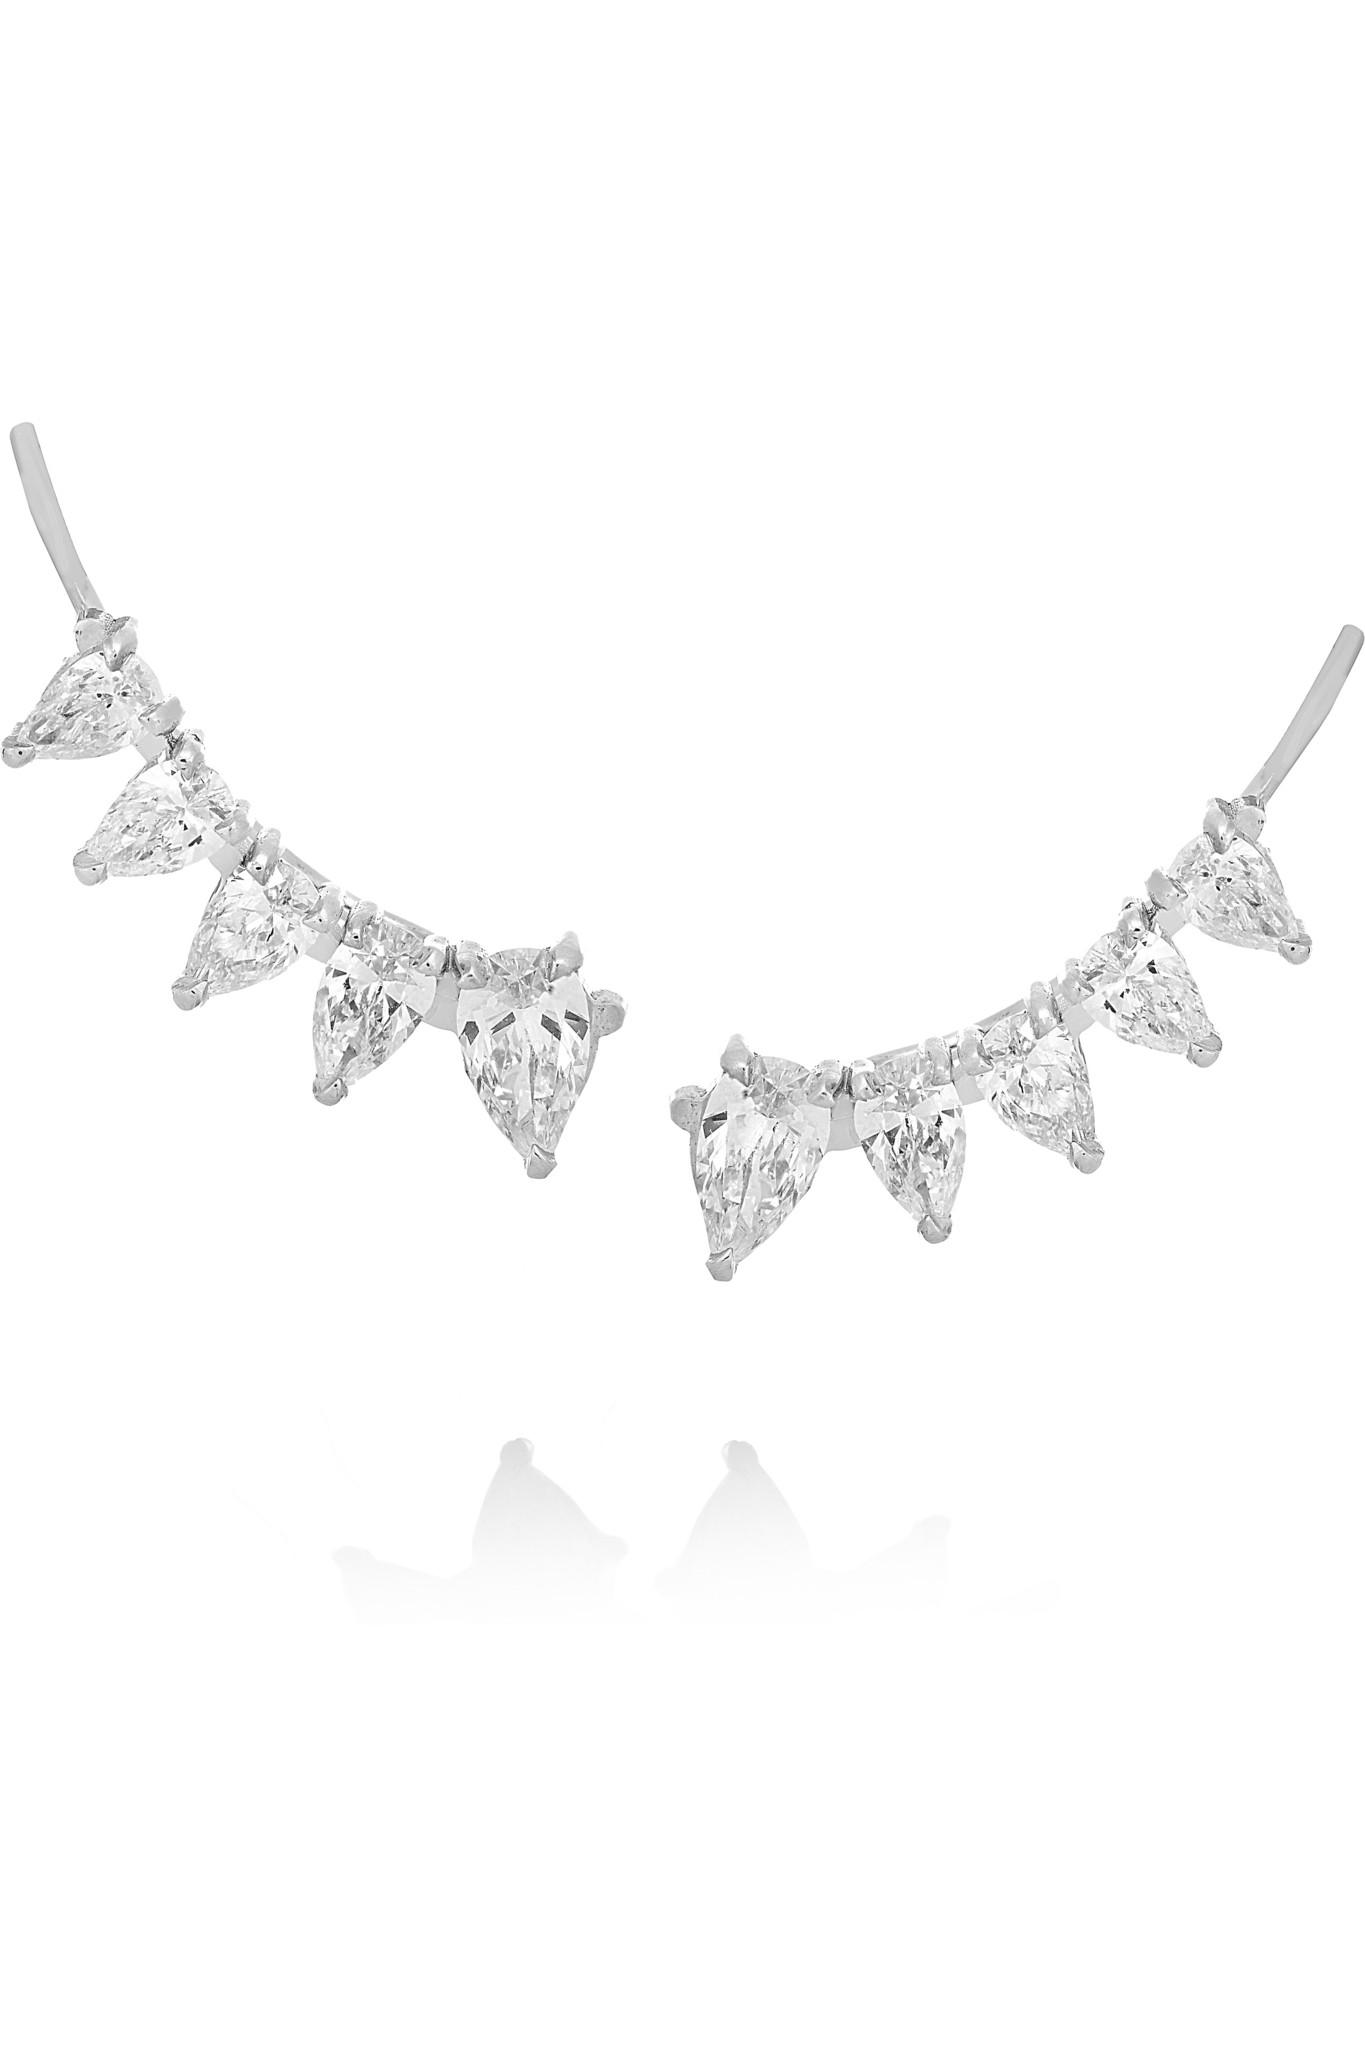 Anita Ko Floating 18-karat White Gold Diamond Earrings JaohfWI